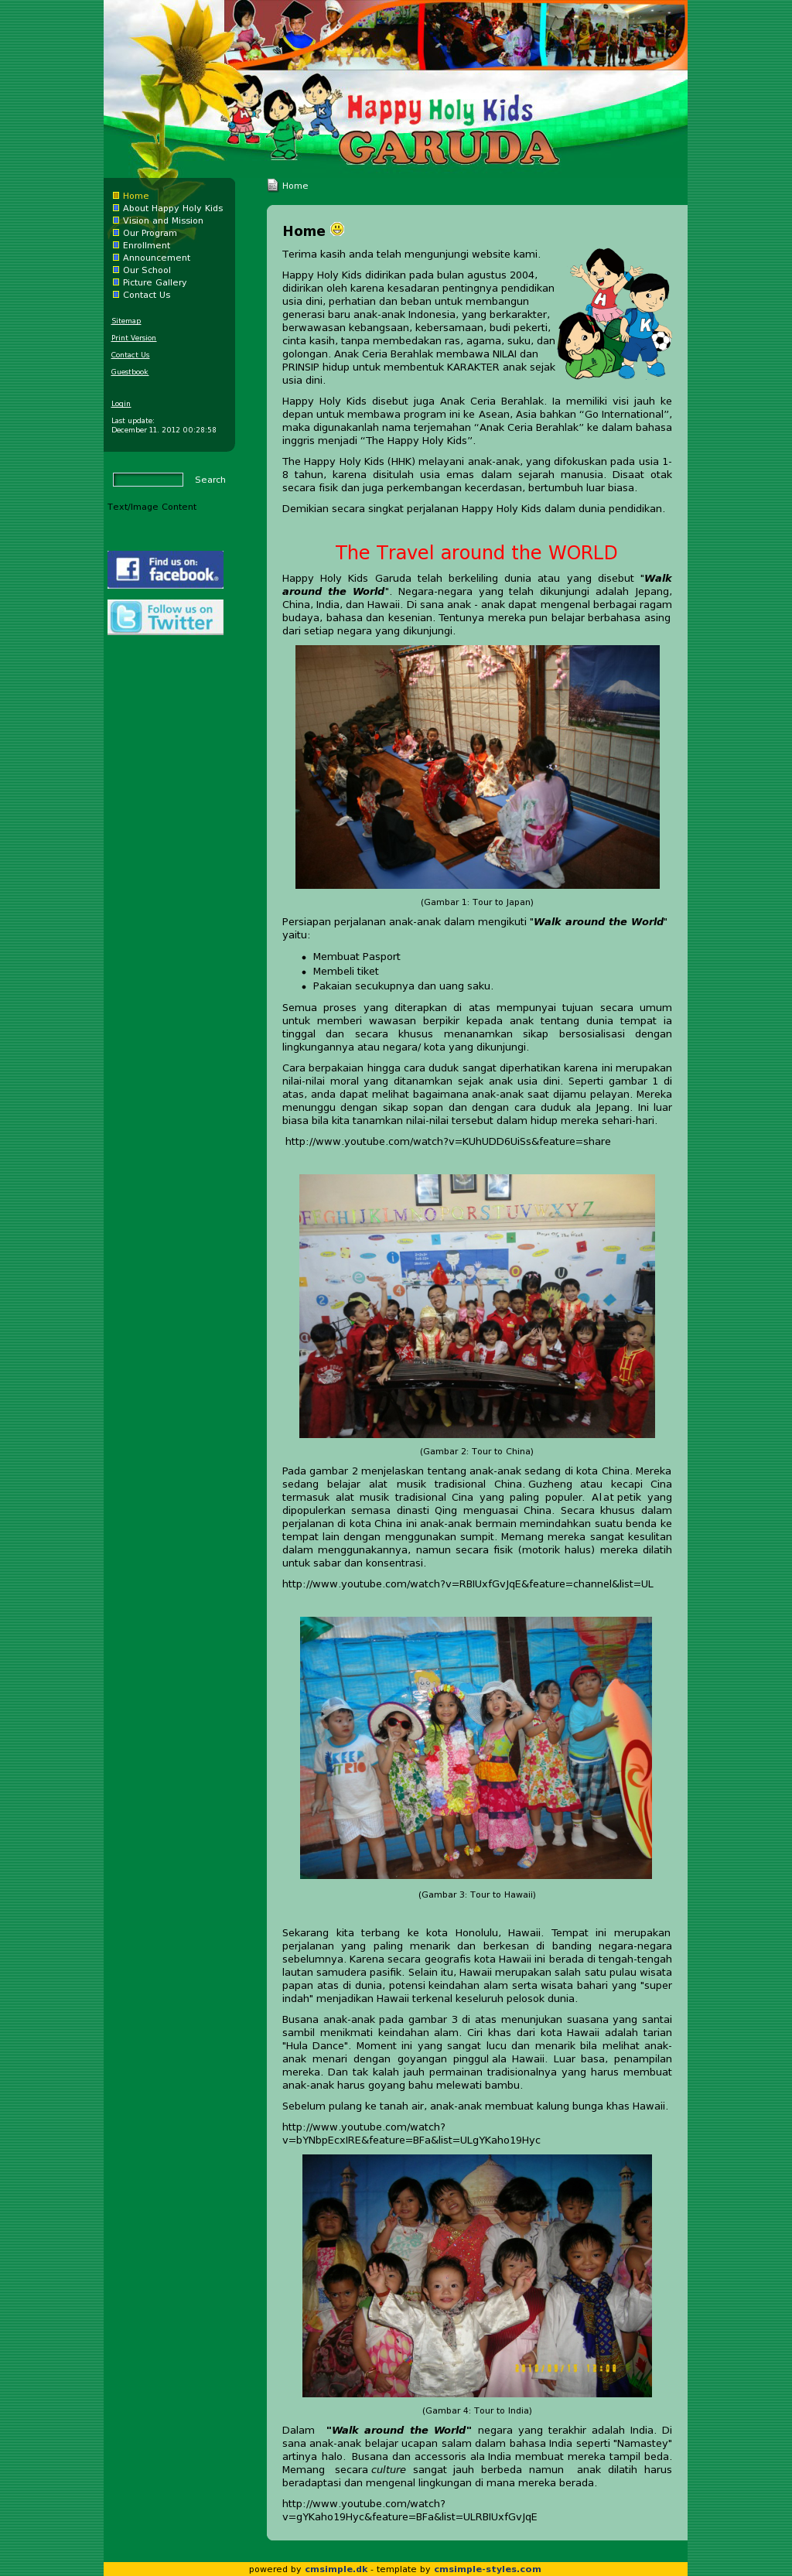 Nusantara Website Petitors Revenue And Employees Owler